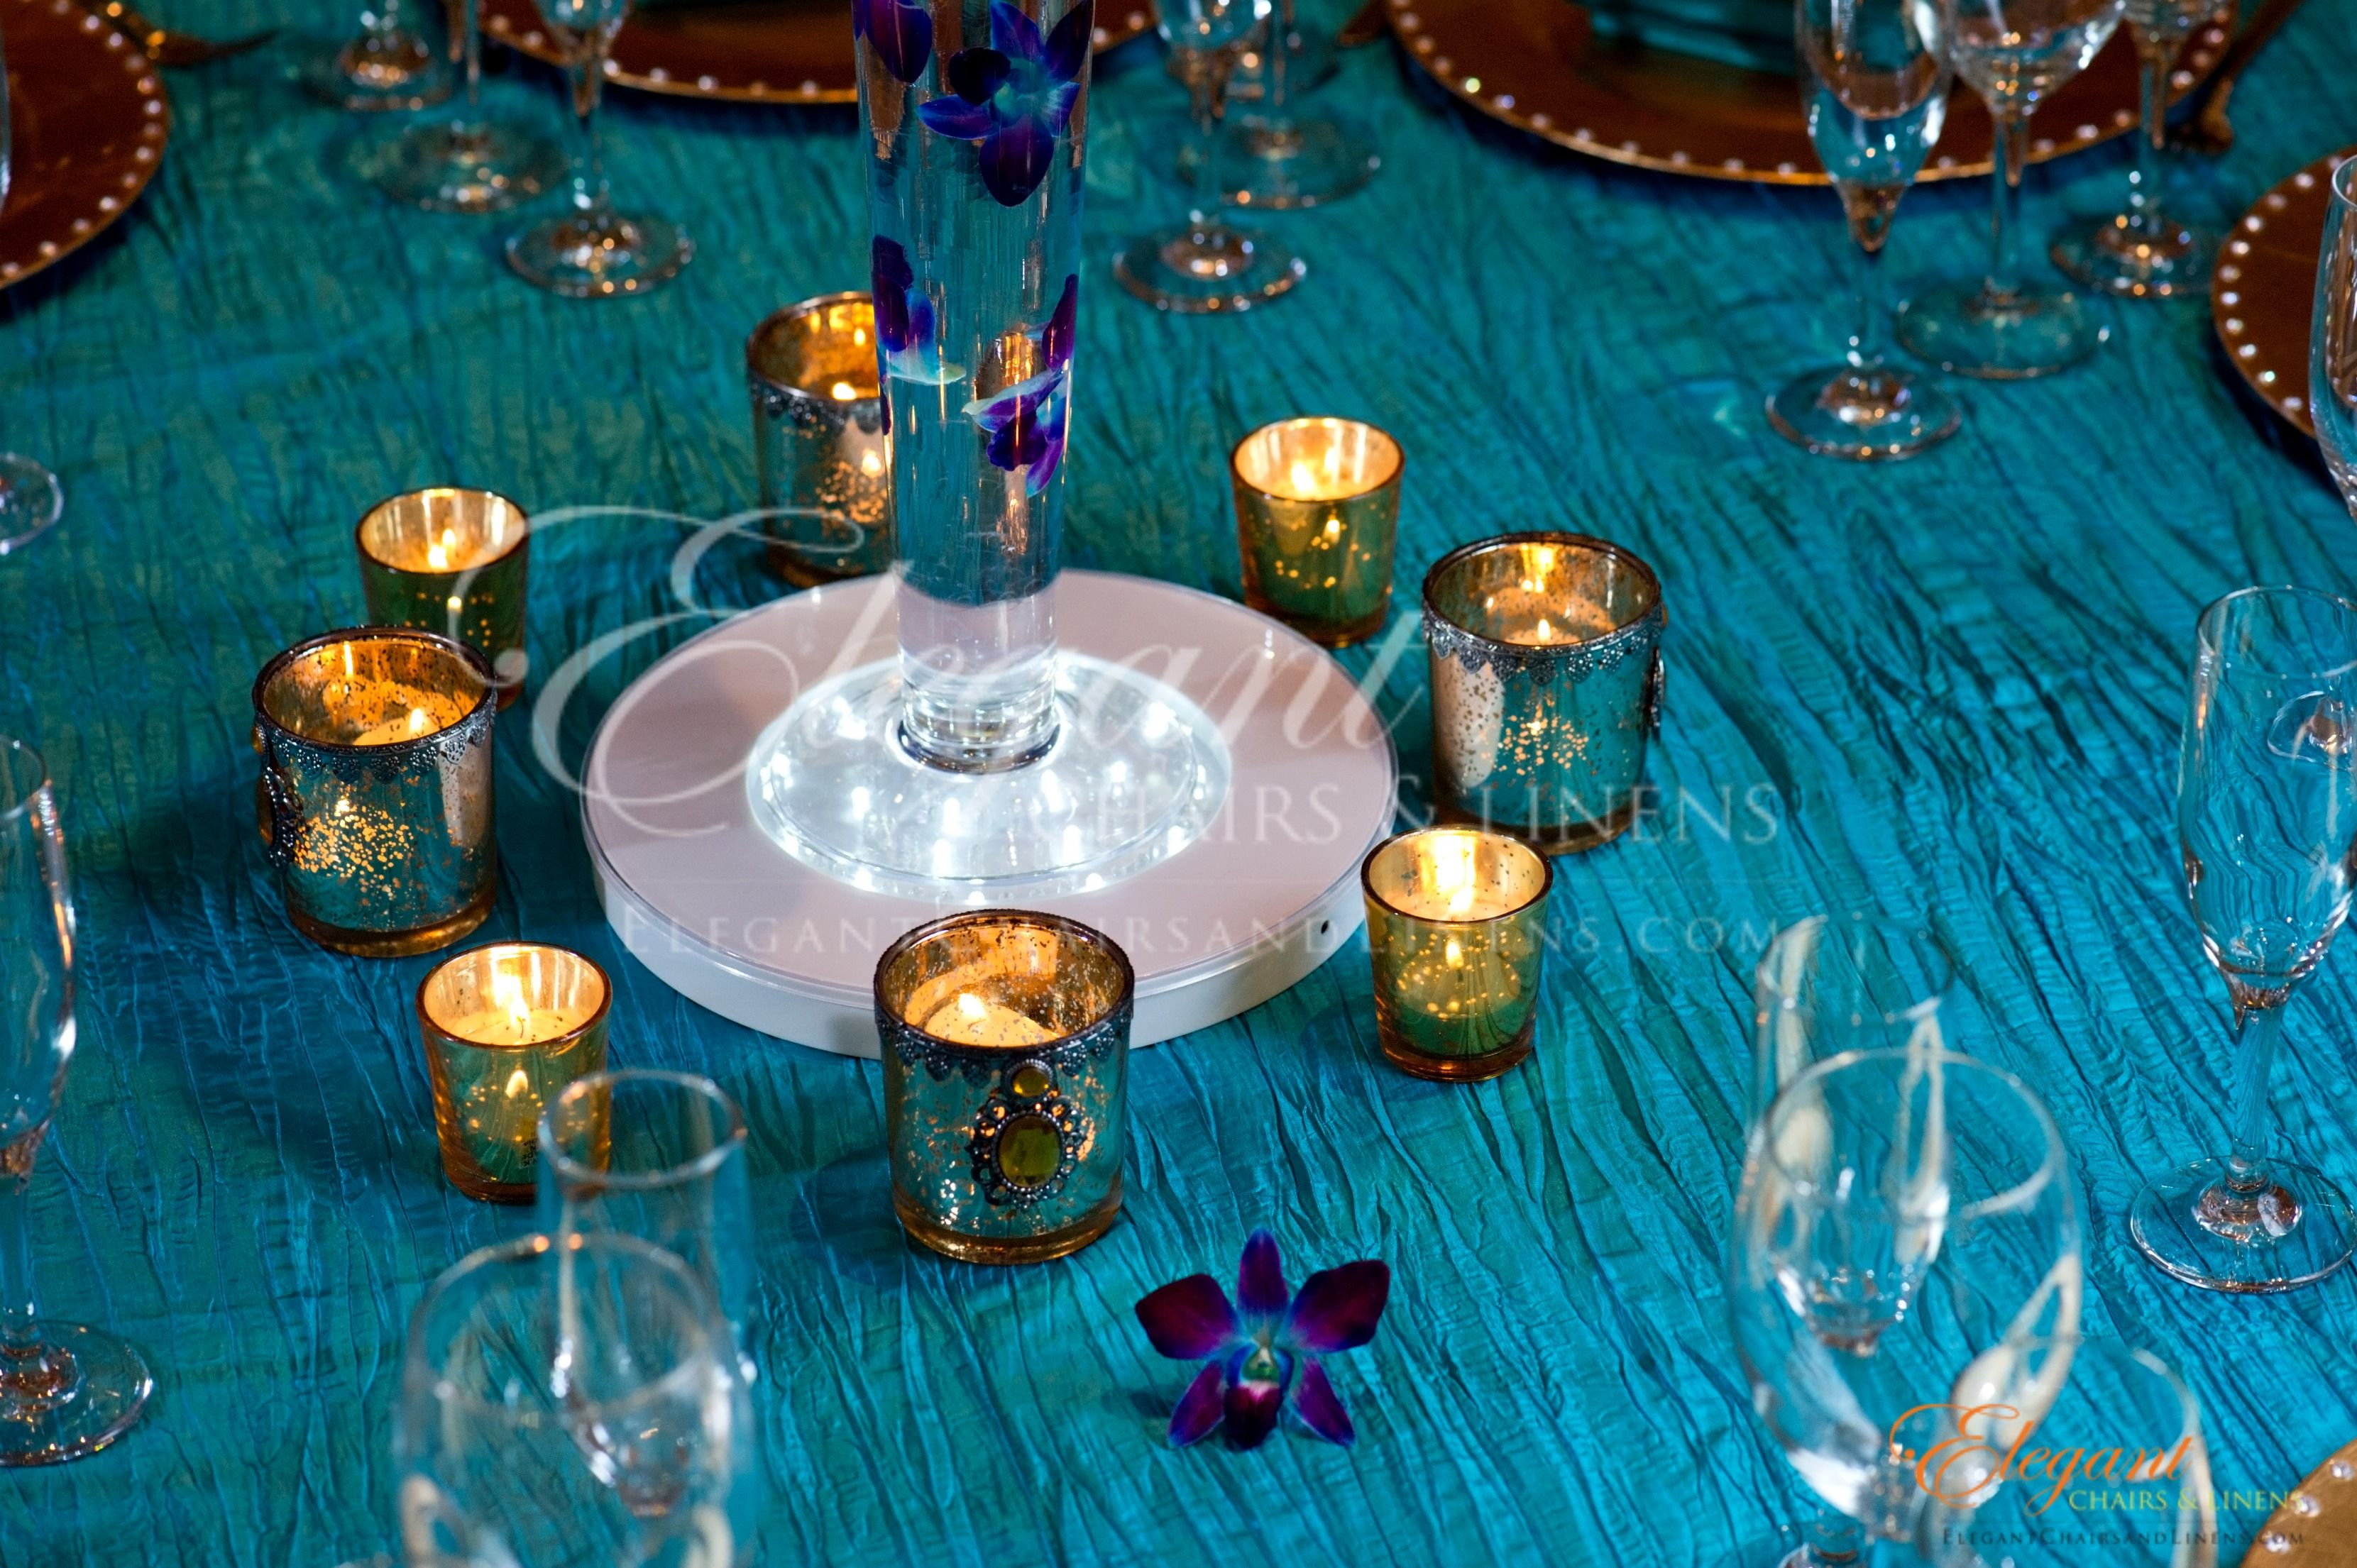 Wedding And Event Linens In Atlanta Ga Linens And Chiavari Chair Rental Atlanta Ga Www Elegantchairsandlinens C Linen Rentals Elegant Chair Atlanta Wedding